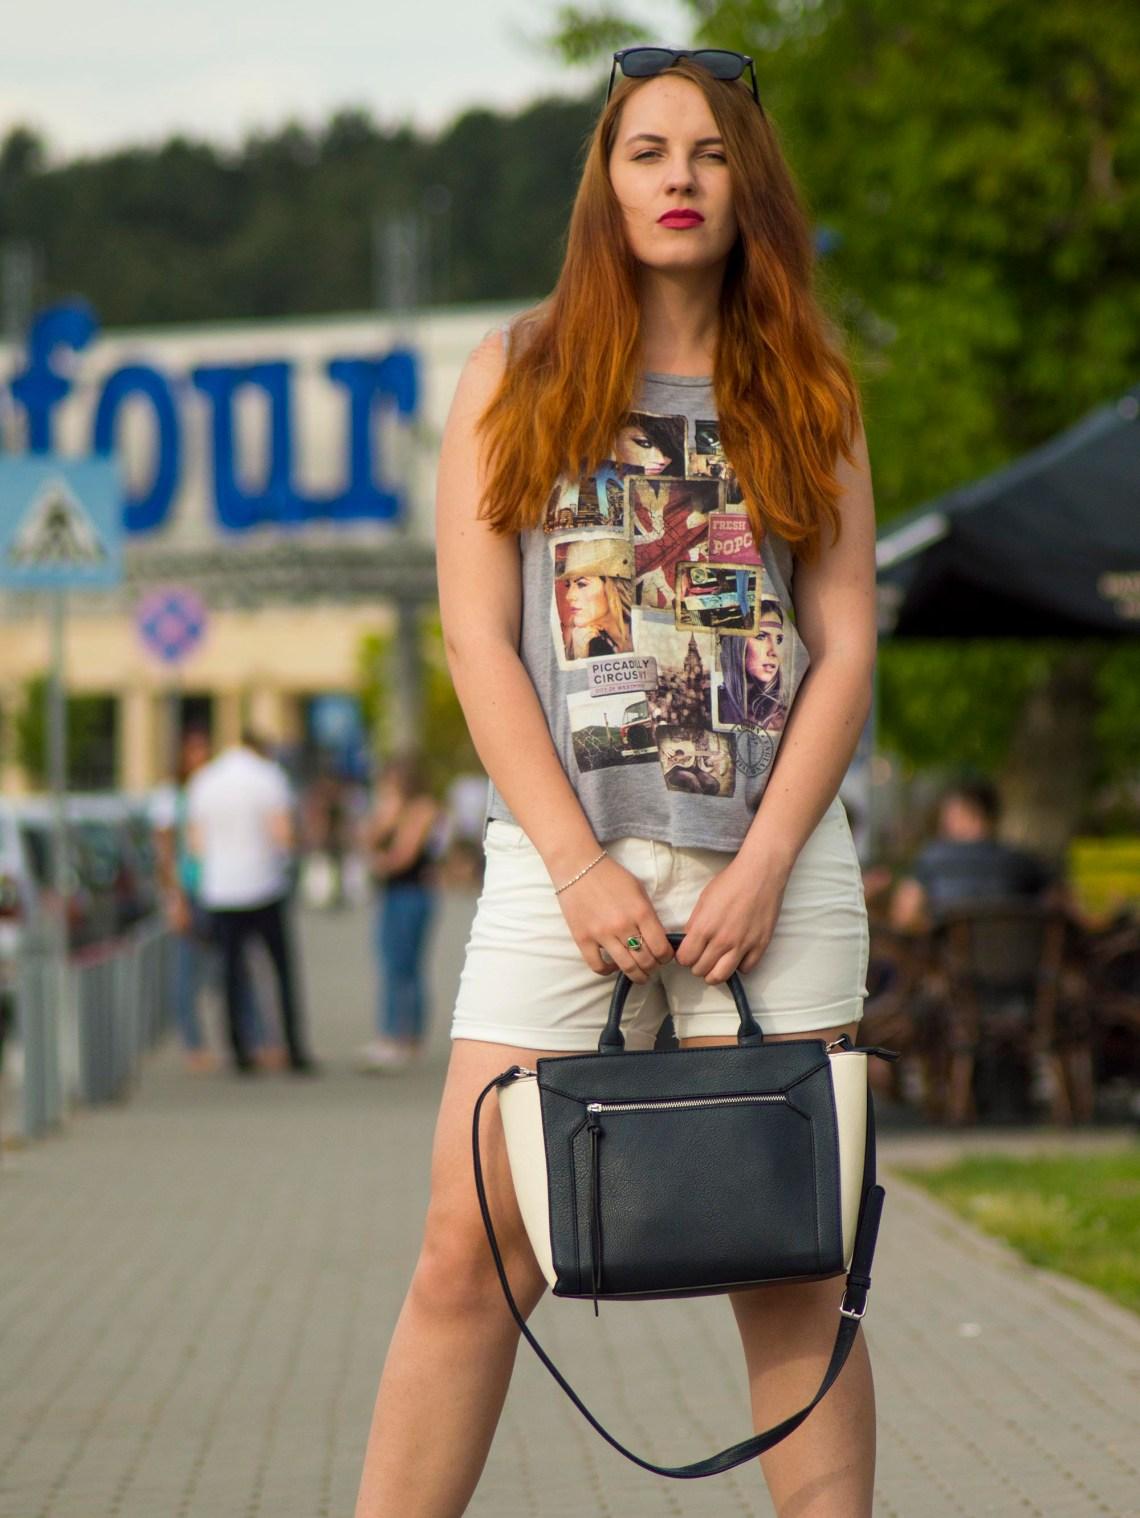 london vibes - summer outfit bloggerissa (5)